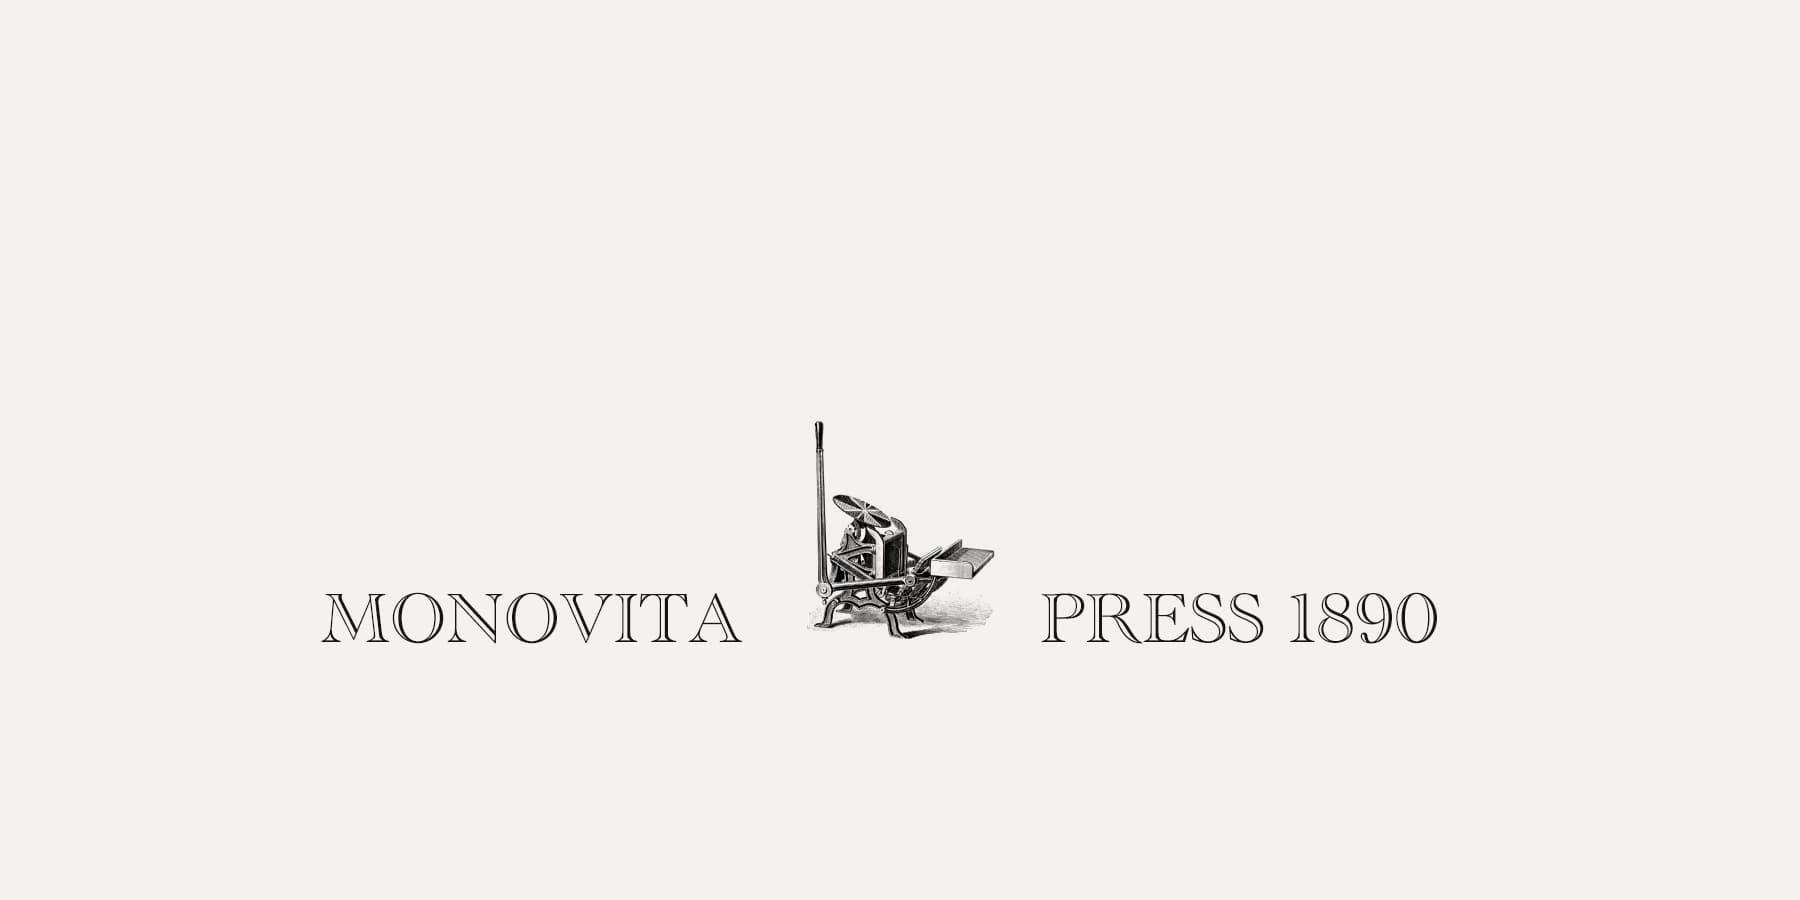 Press 1890